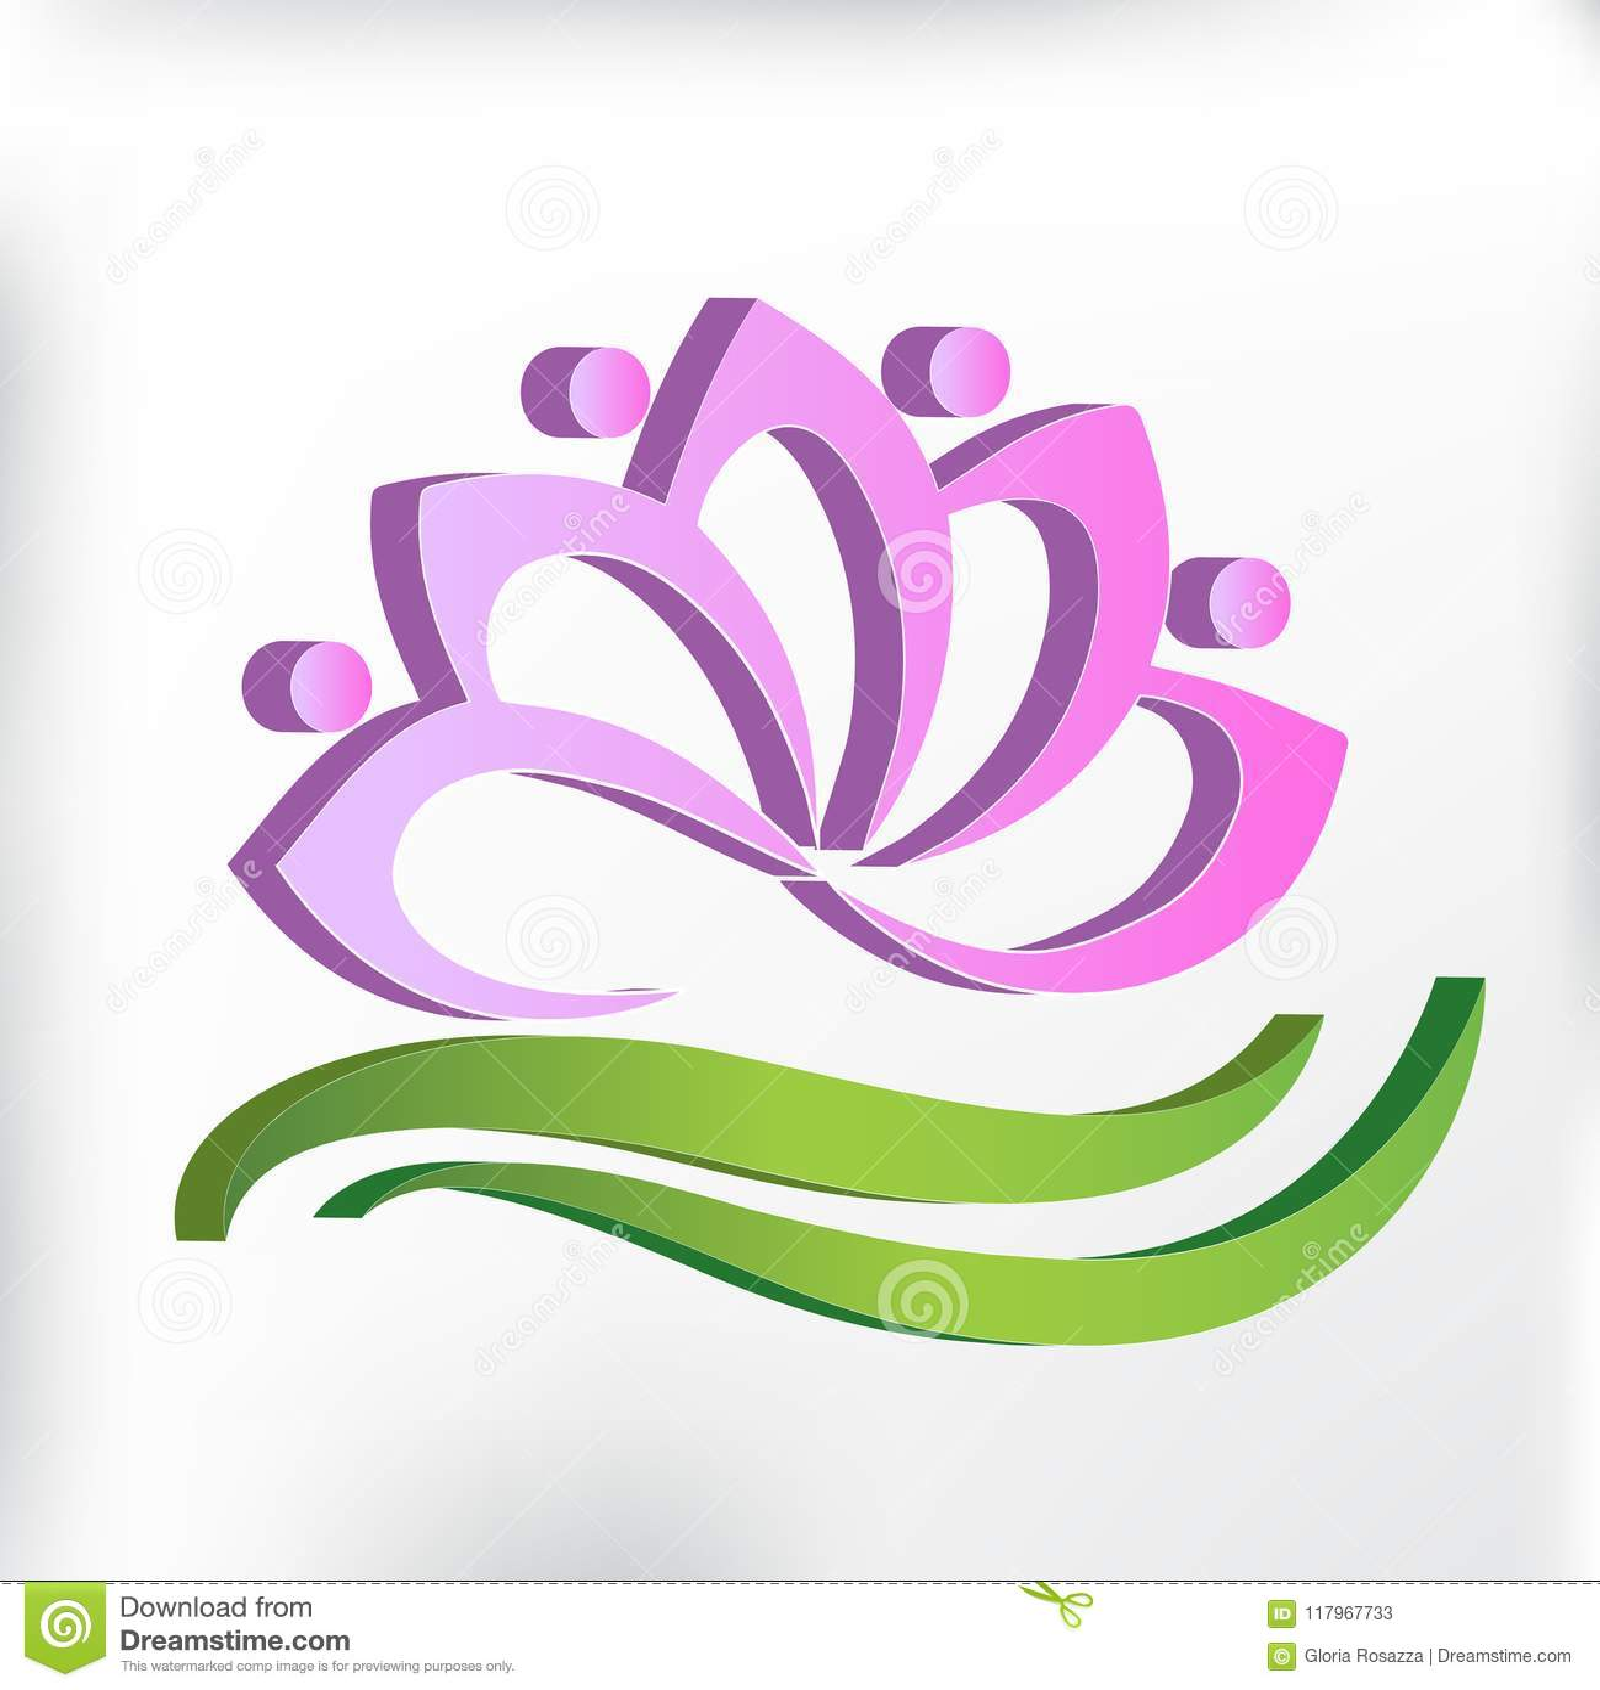 Lotus flower yoga teamwork 3d logo vector image illustration graphic download lotus flower yoga teamwork 3d logo vector image illustration graphic design stock vector illustration izmirmasajfo